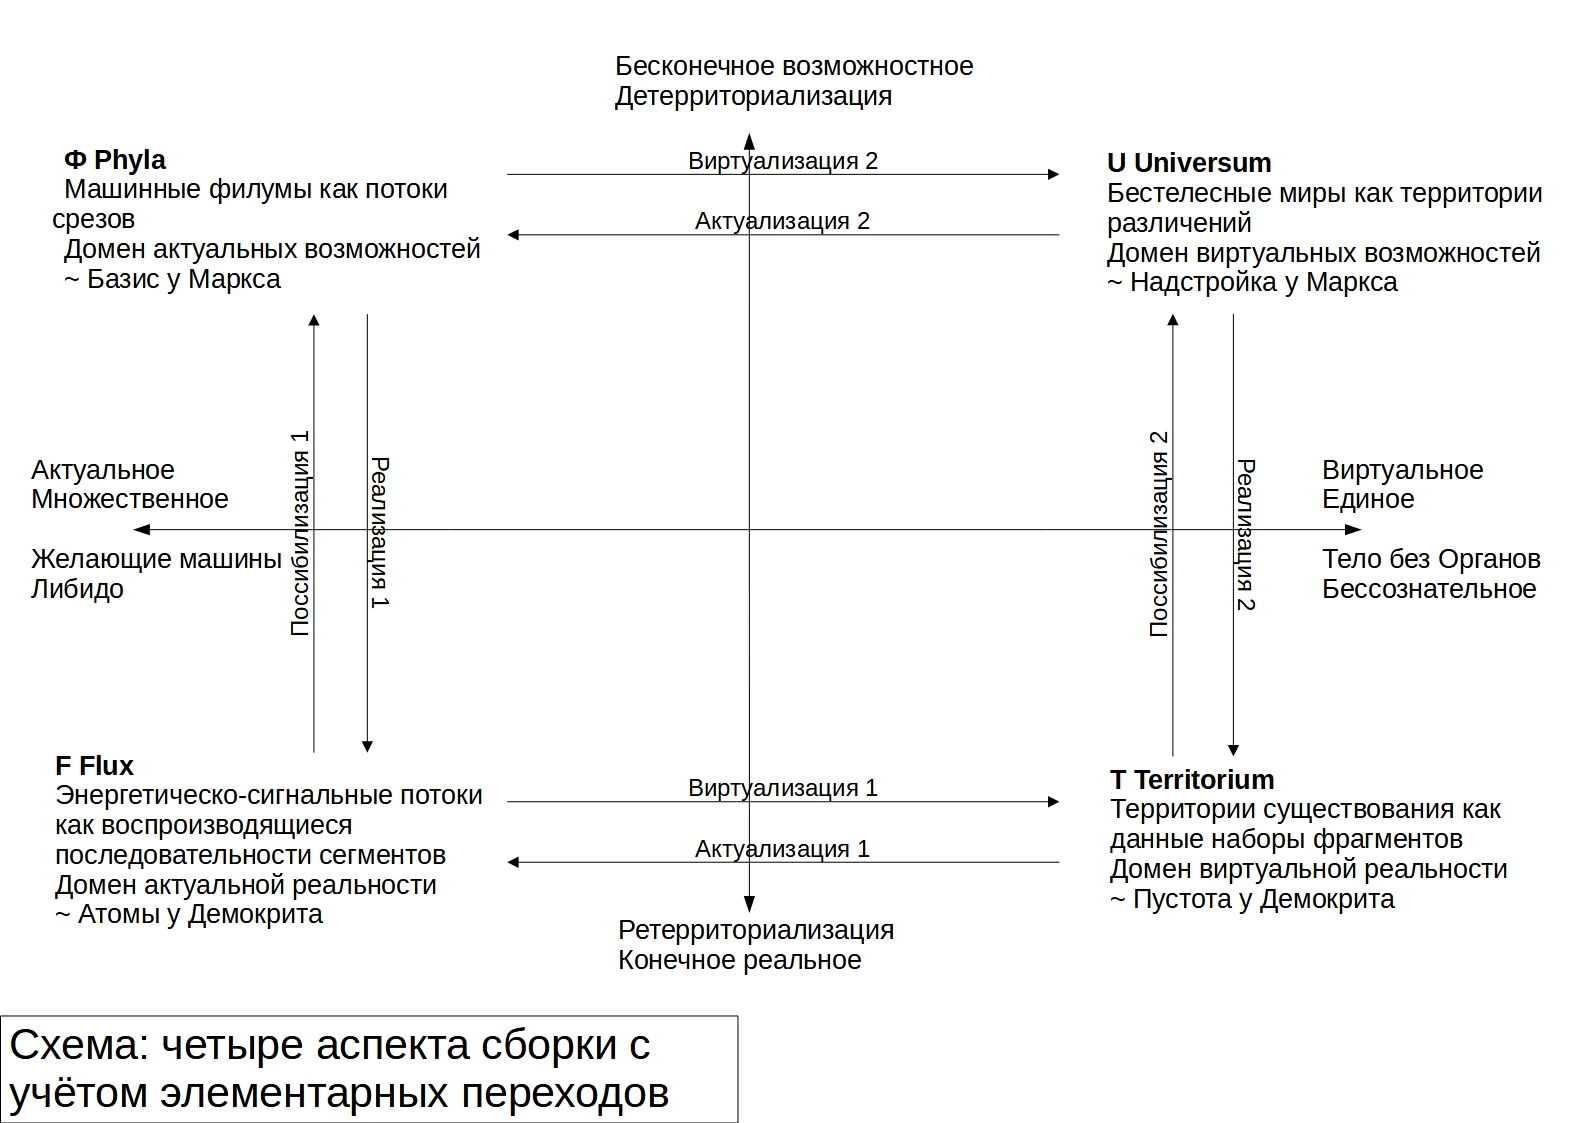 Схема сборок, 2-й вариант